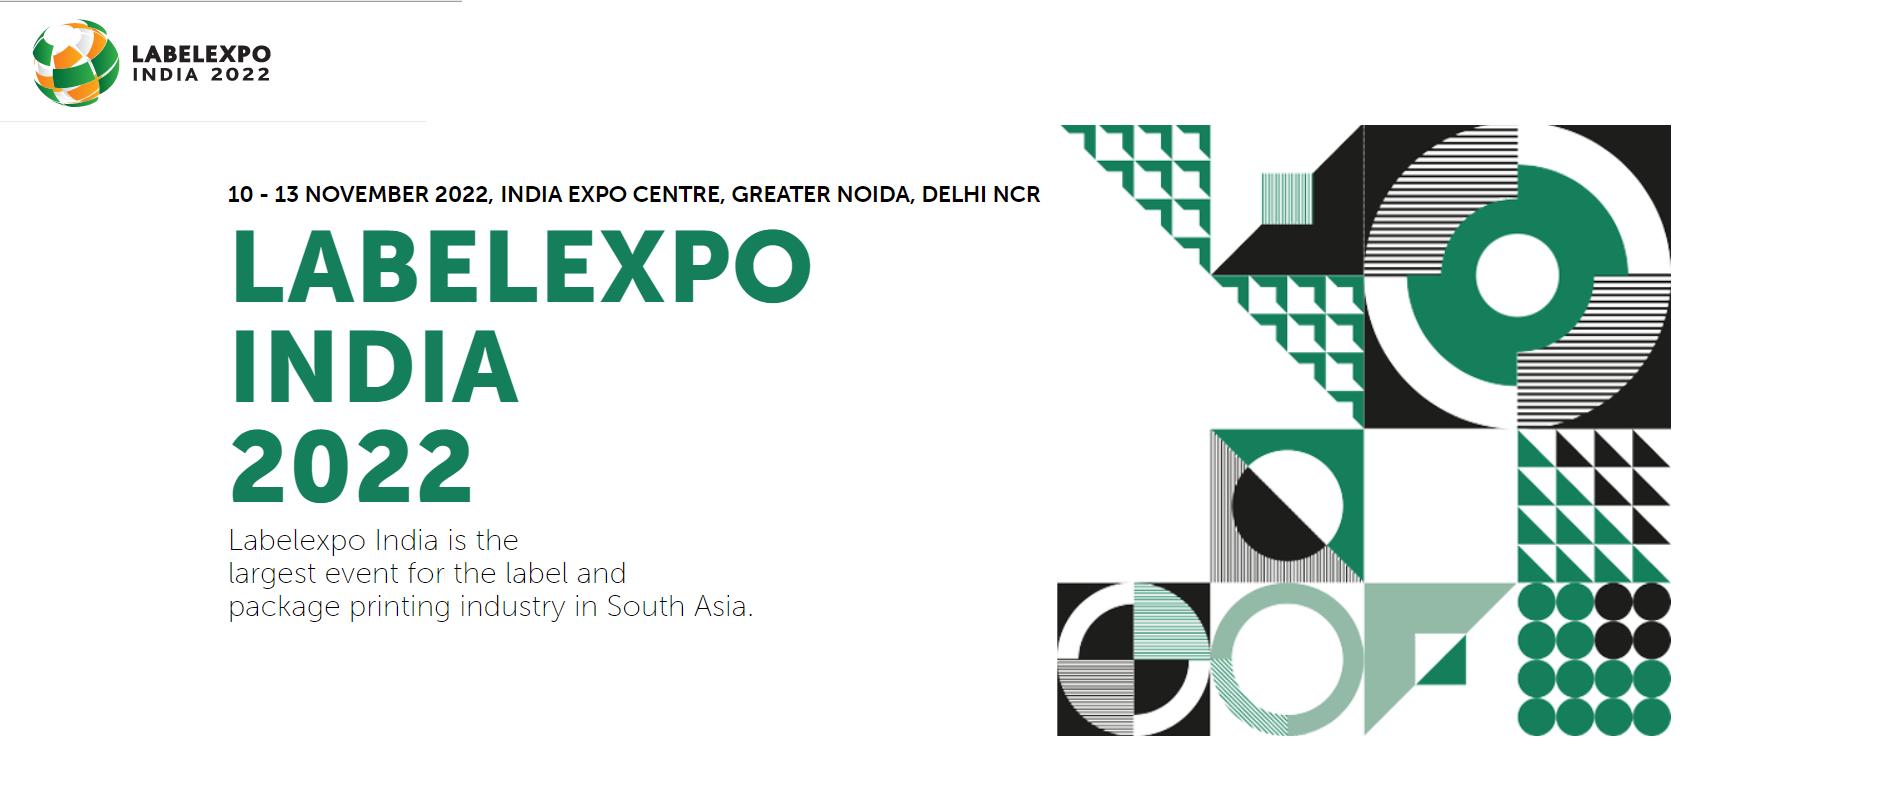 Label Expo India 2022